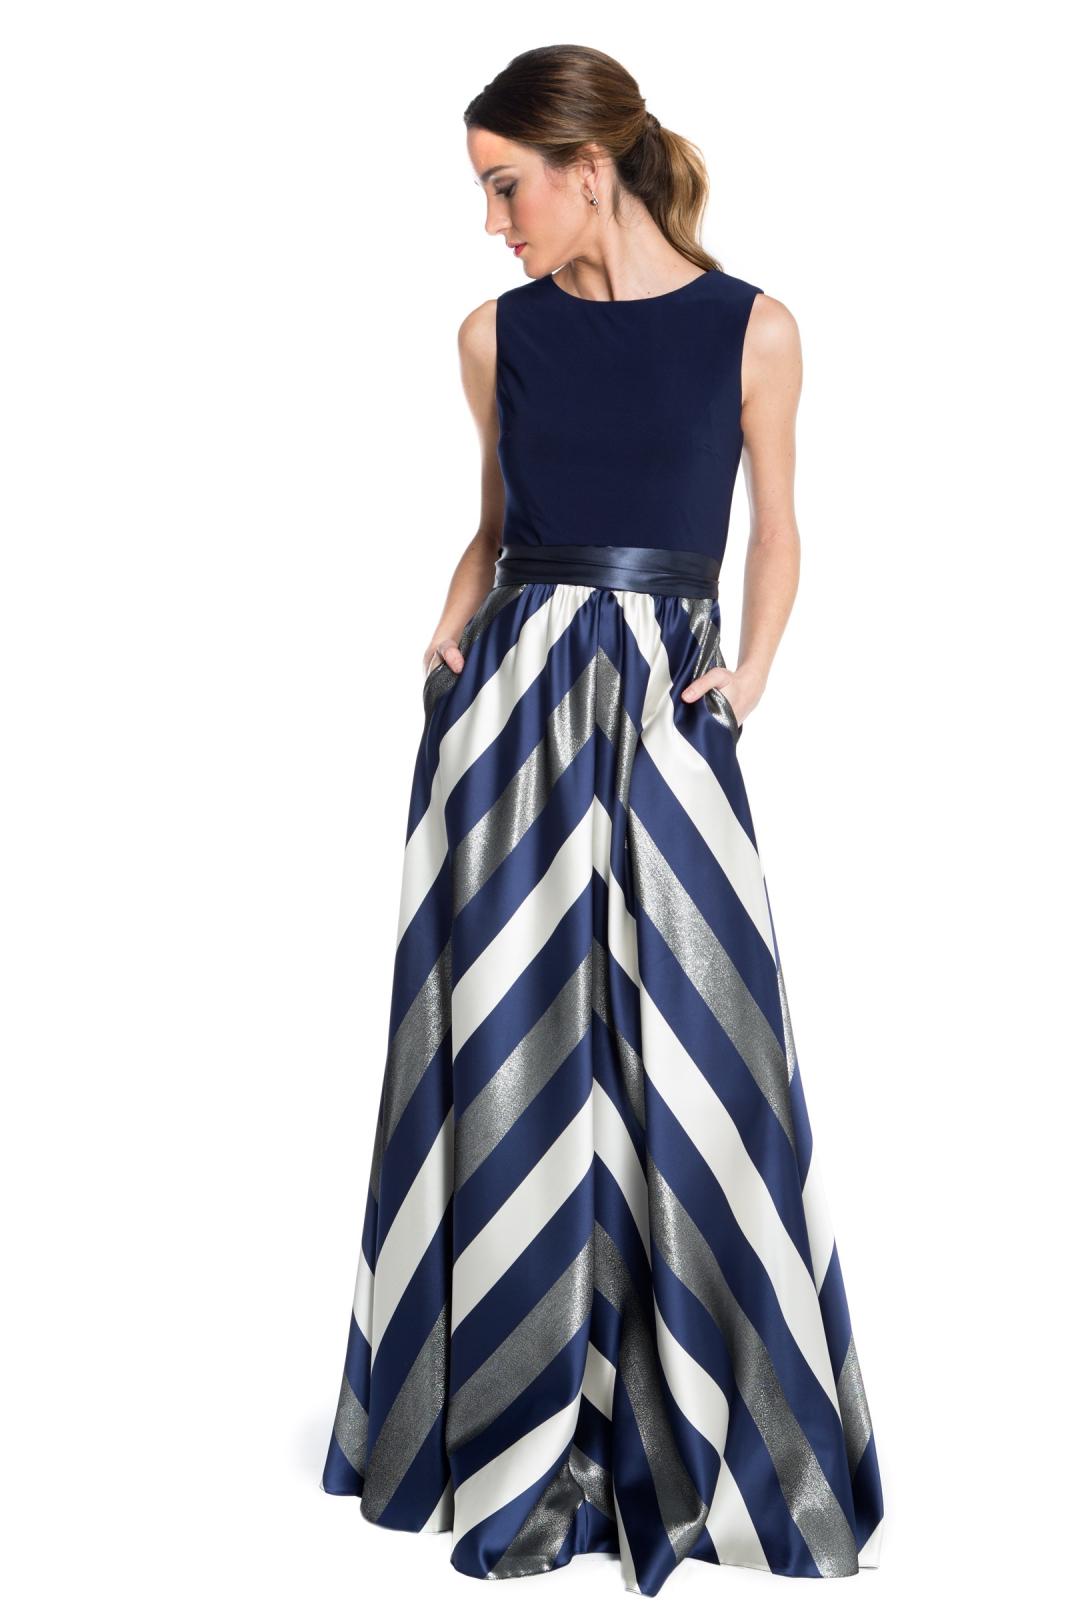 back - Vestido Navy Stripes